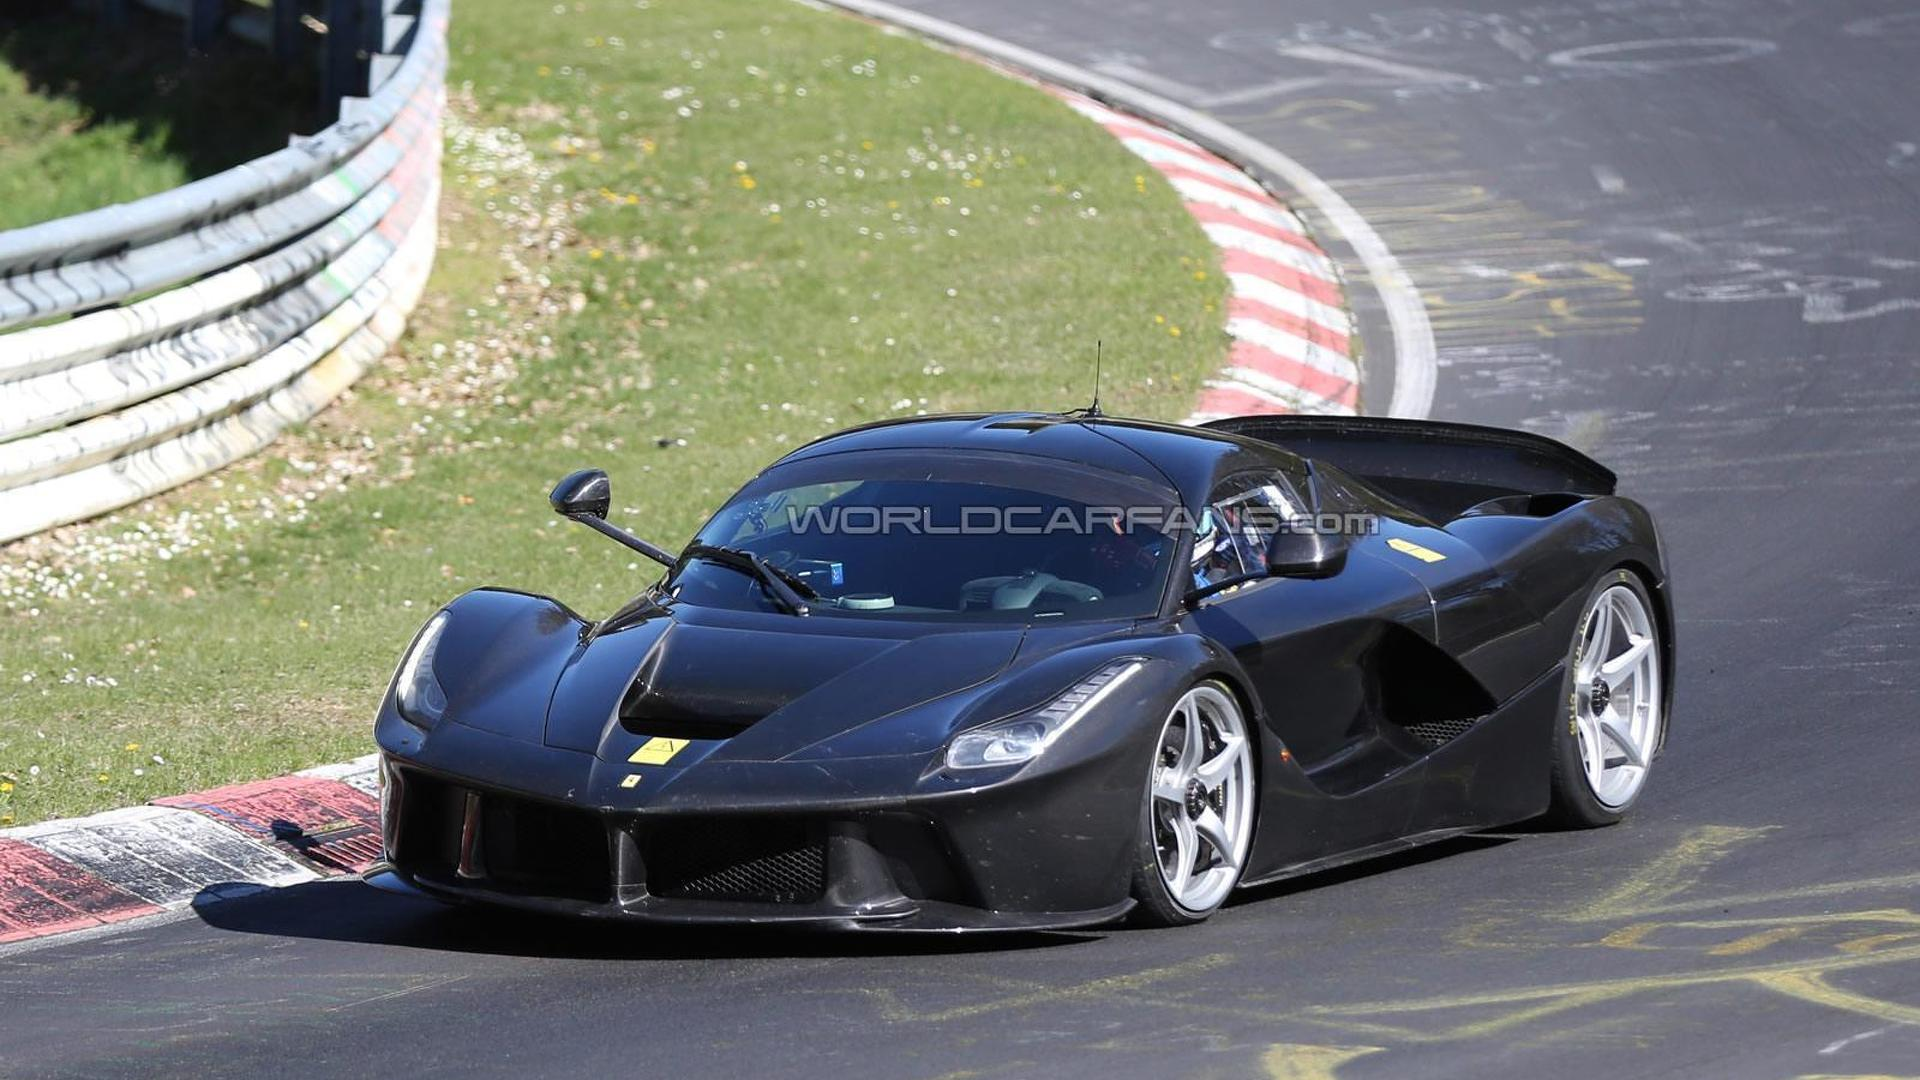 LaFerrari XX mule spied on the Nurburgring, 6:35 lap time rumored